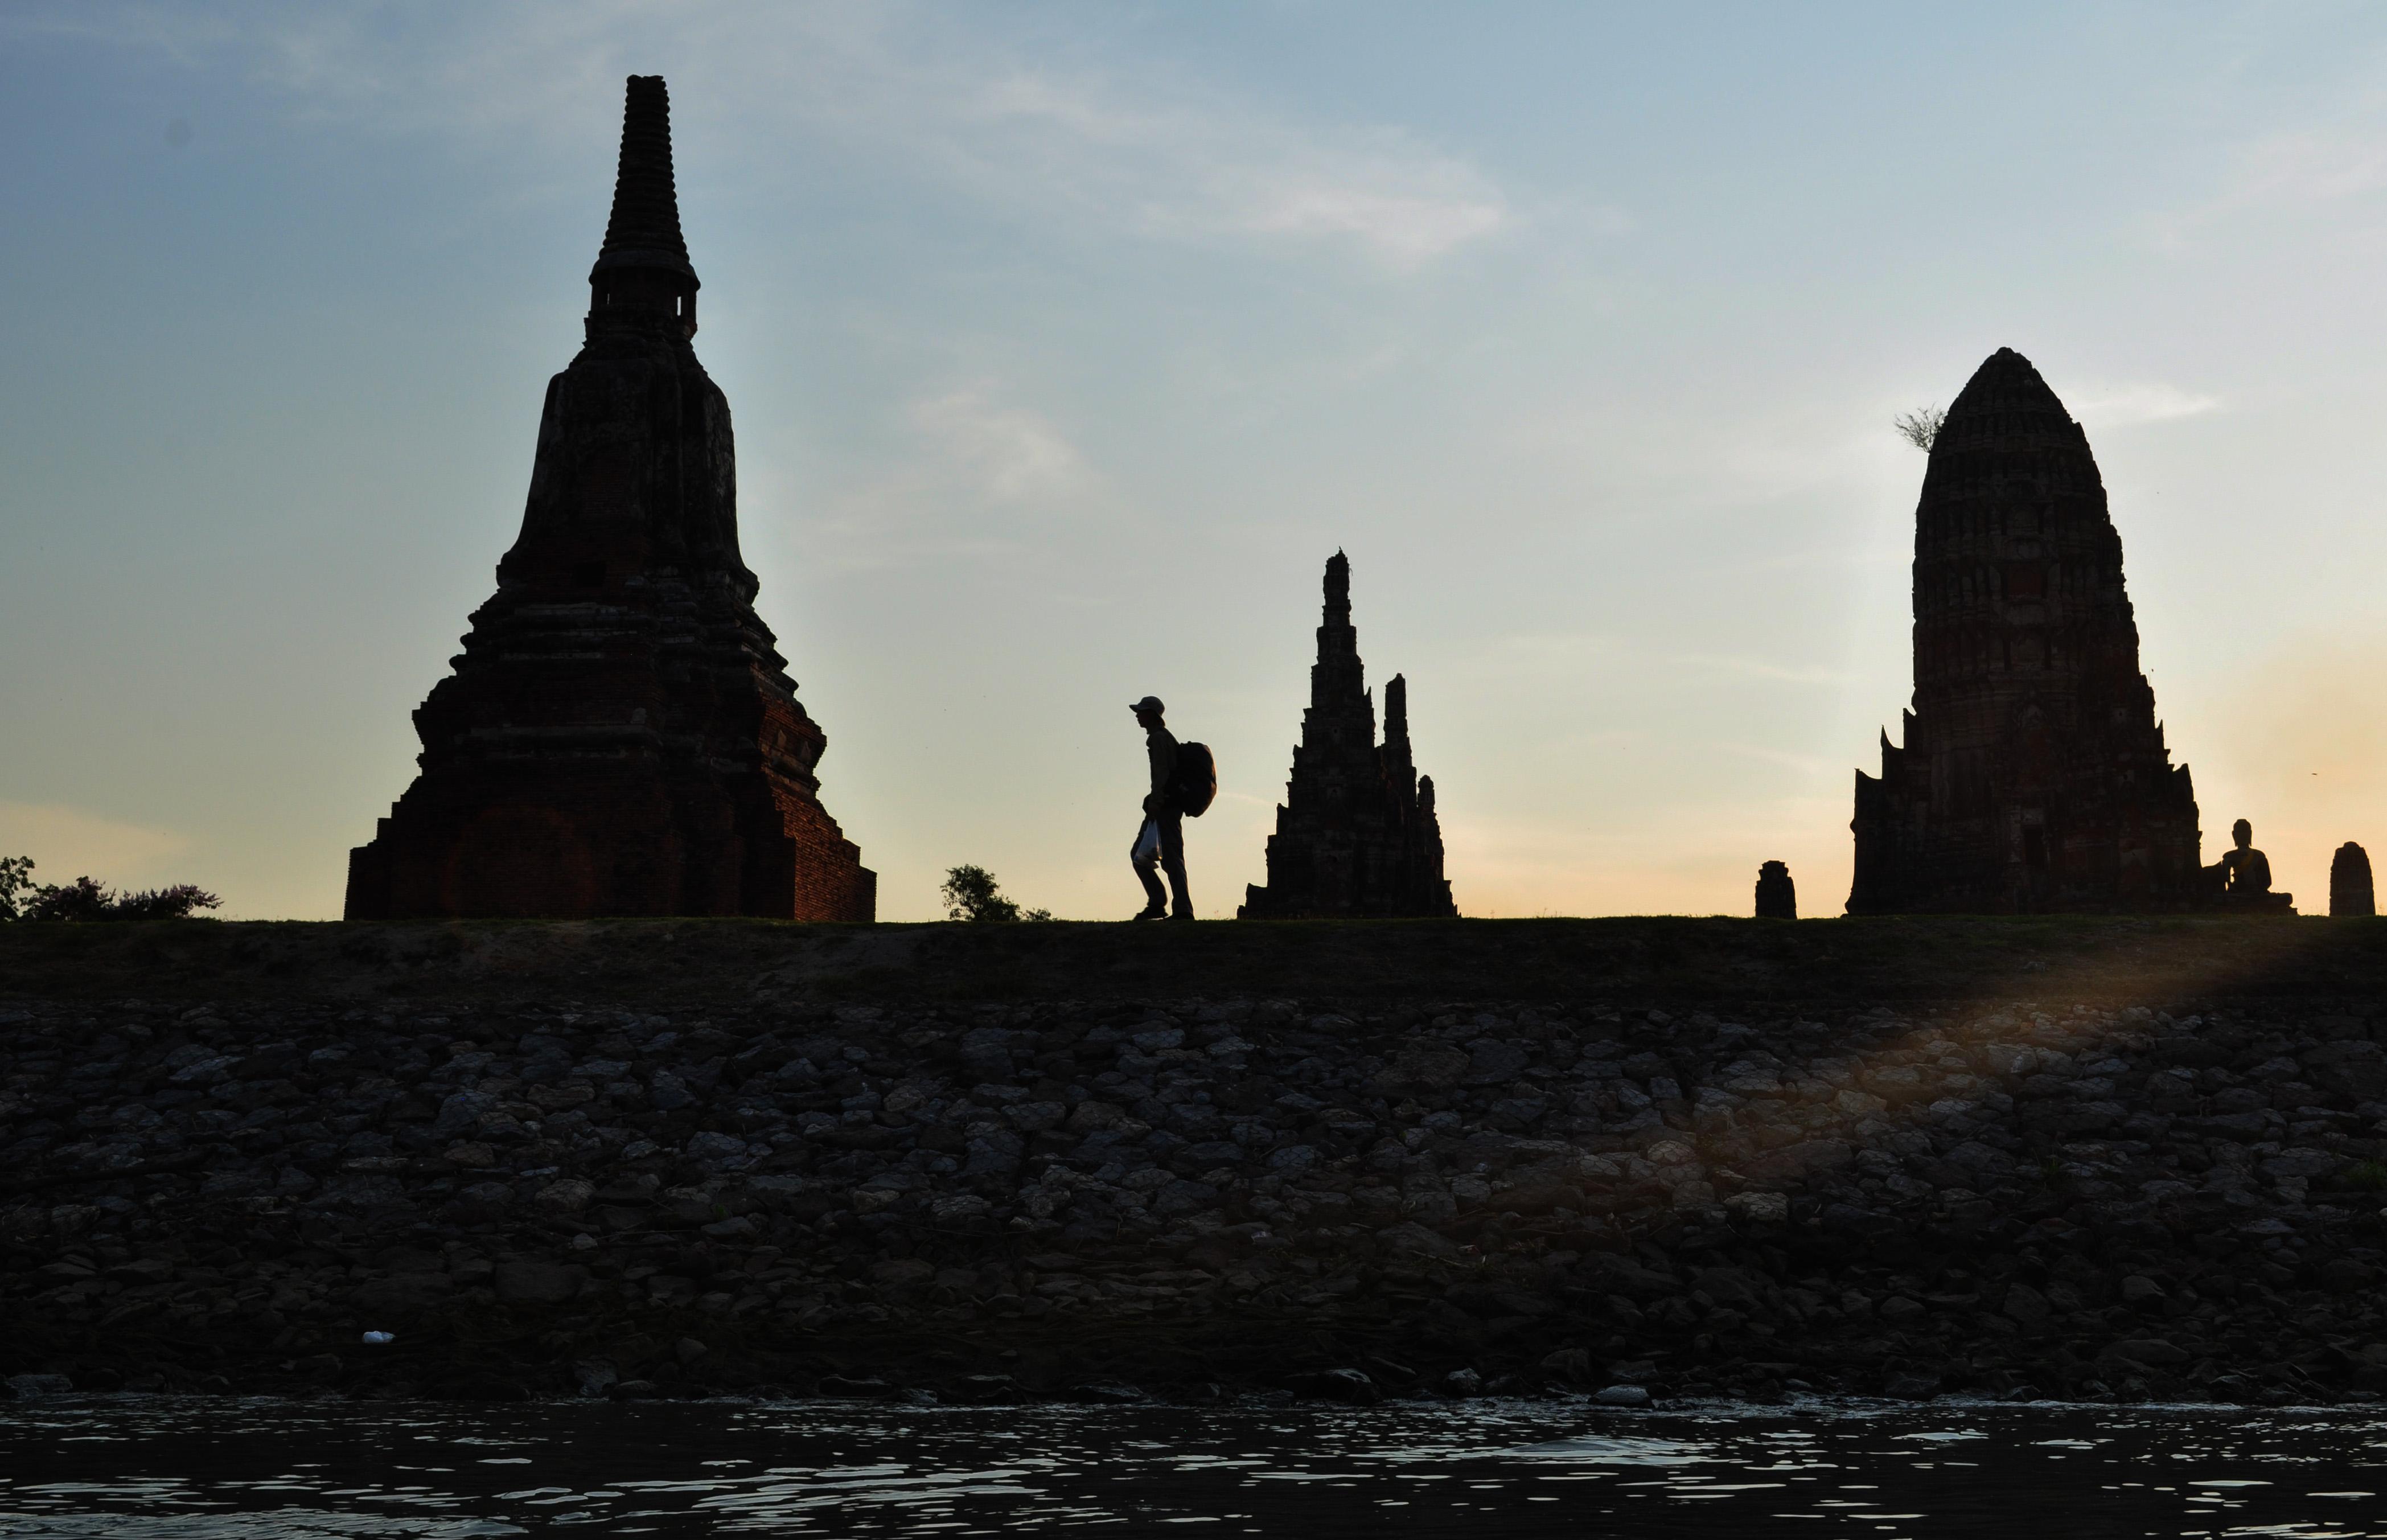 Itinéraire 2,5 semaines – Thaïlande (Bangkok, Chiang Mai et îles de la mer d'Andaman)